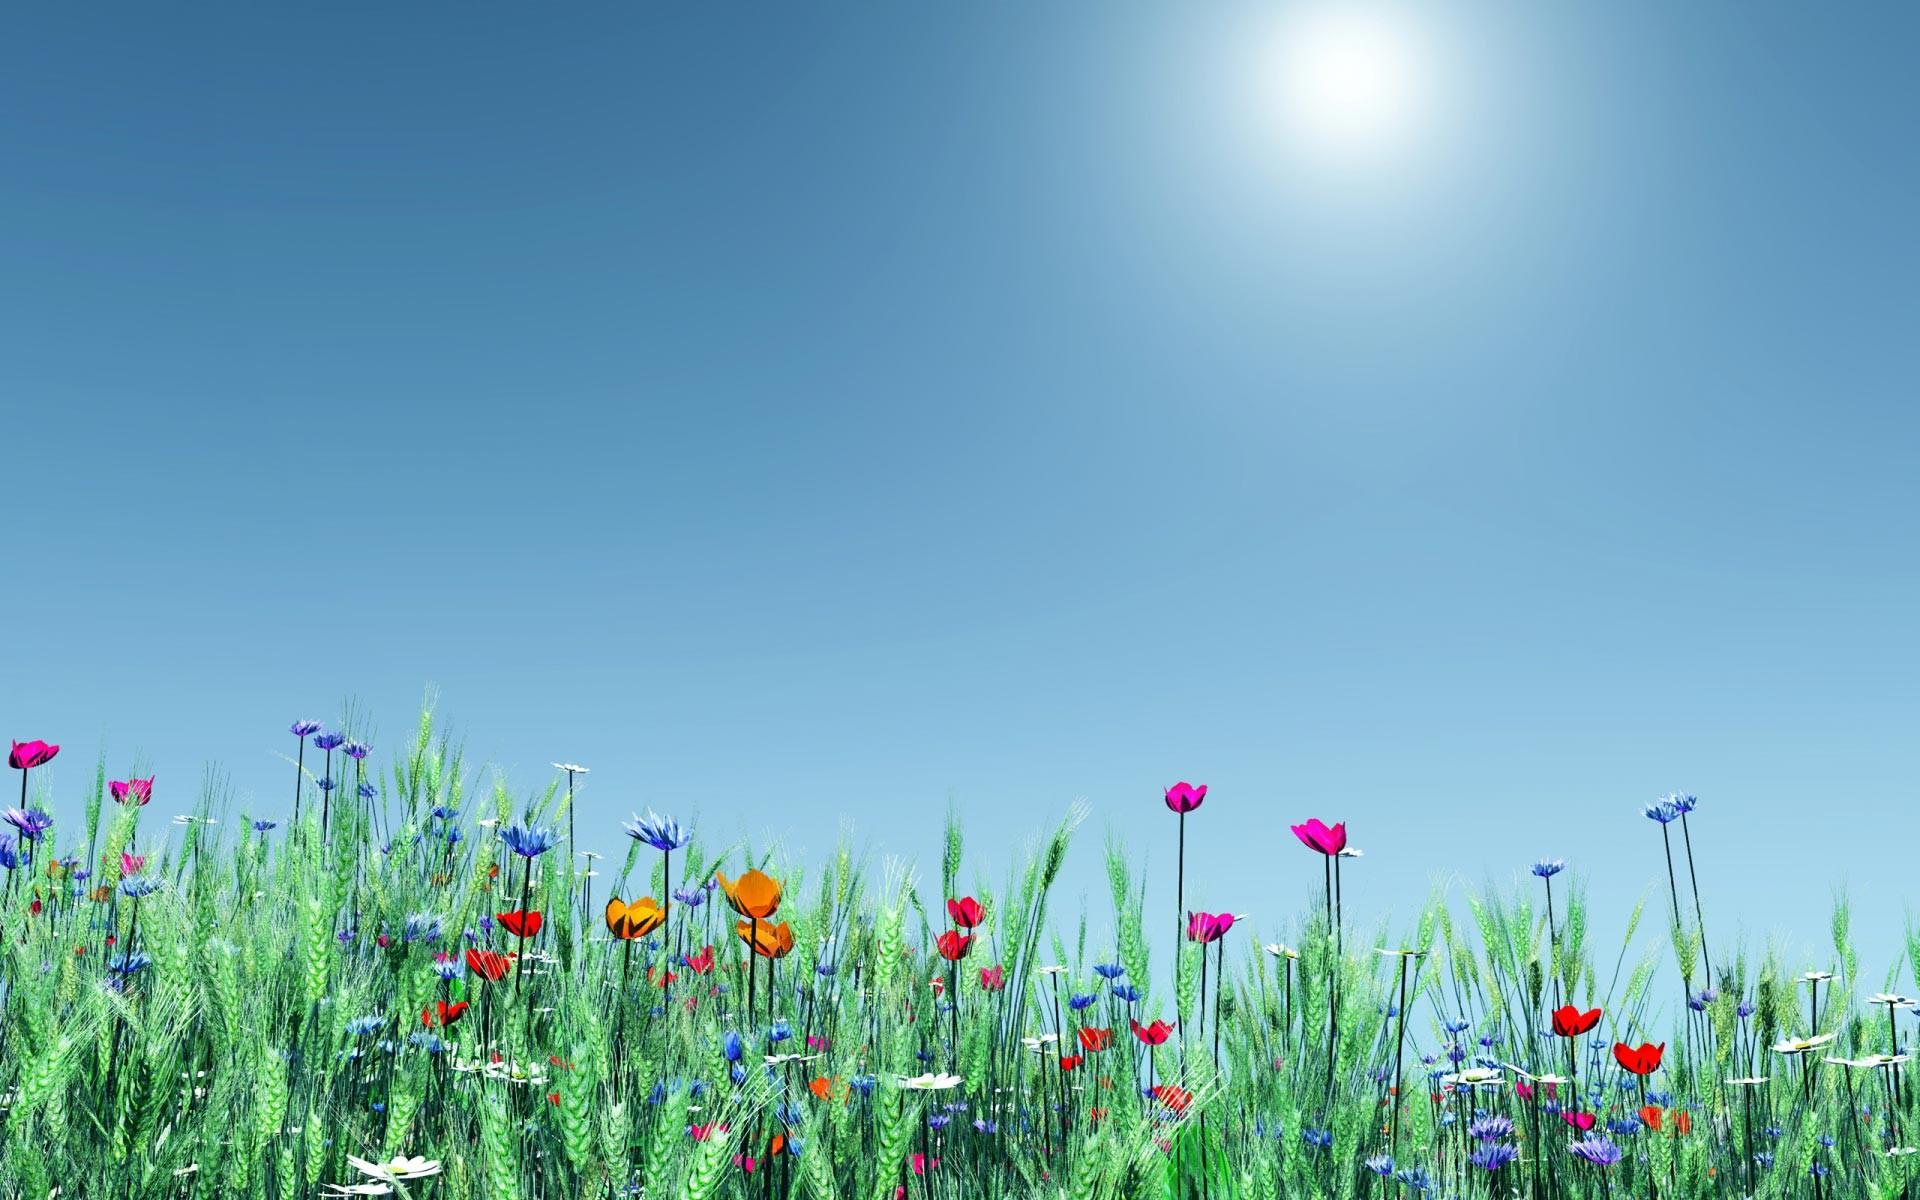 Spring Desktop Wallpaper Widescreen 56 images 1920x1200